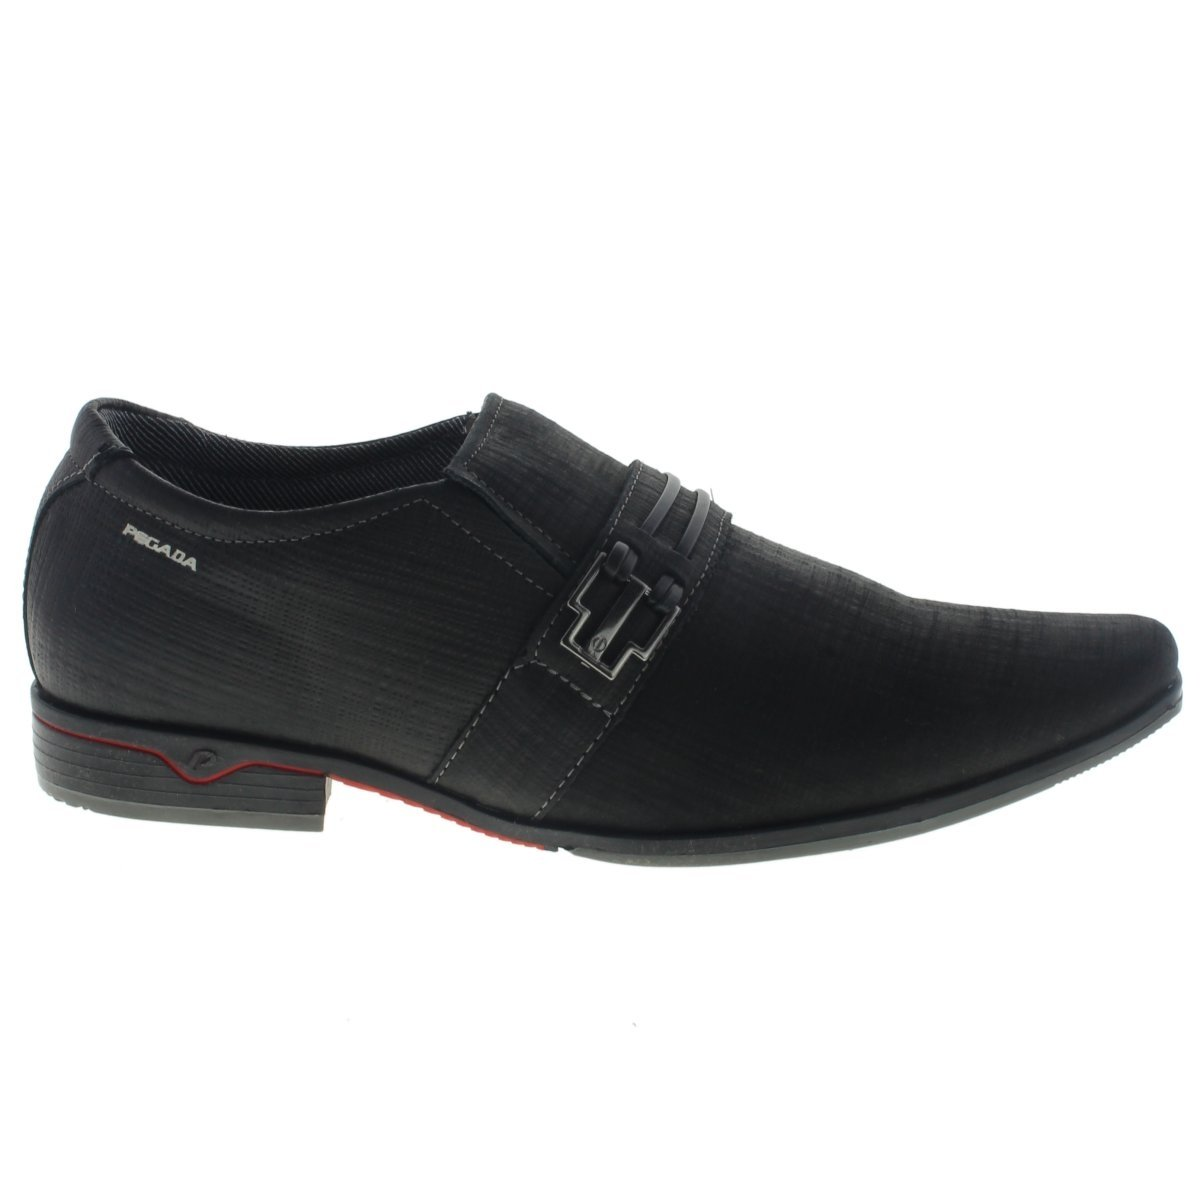 Sapato Pegada Preto Sapato Pegada Pegada Preto Sapato Pegada Sapato Preto qaTEwS